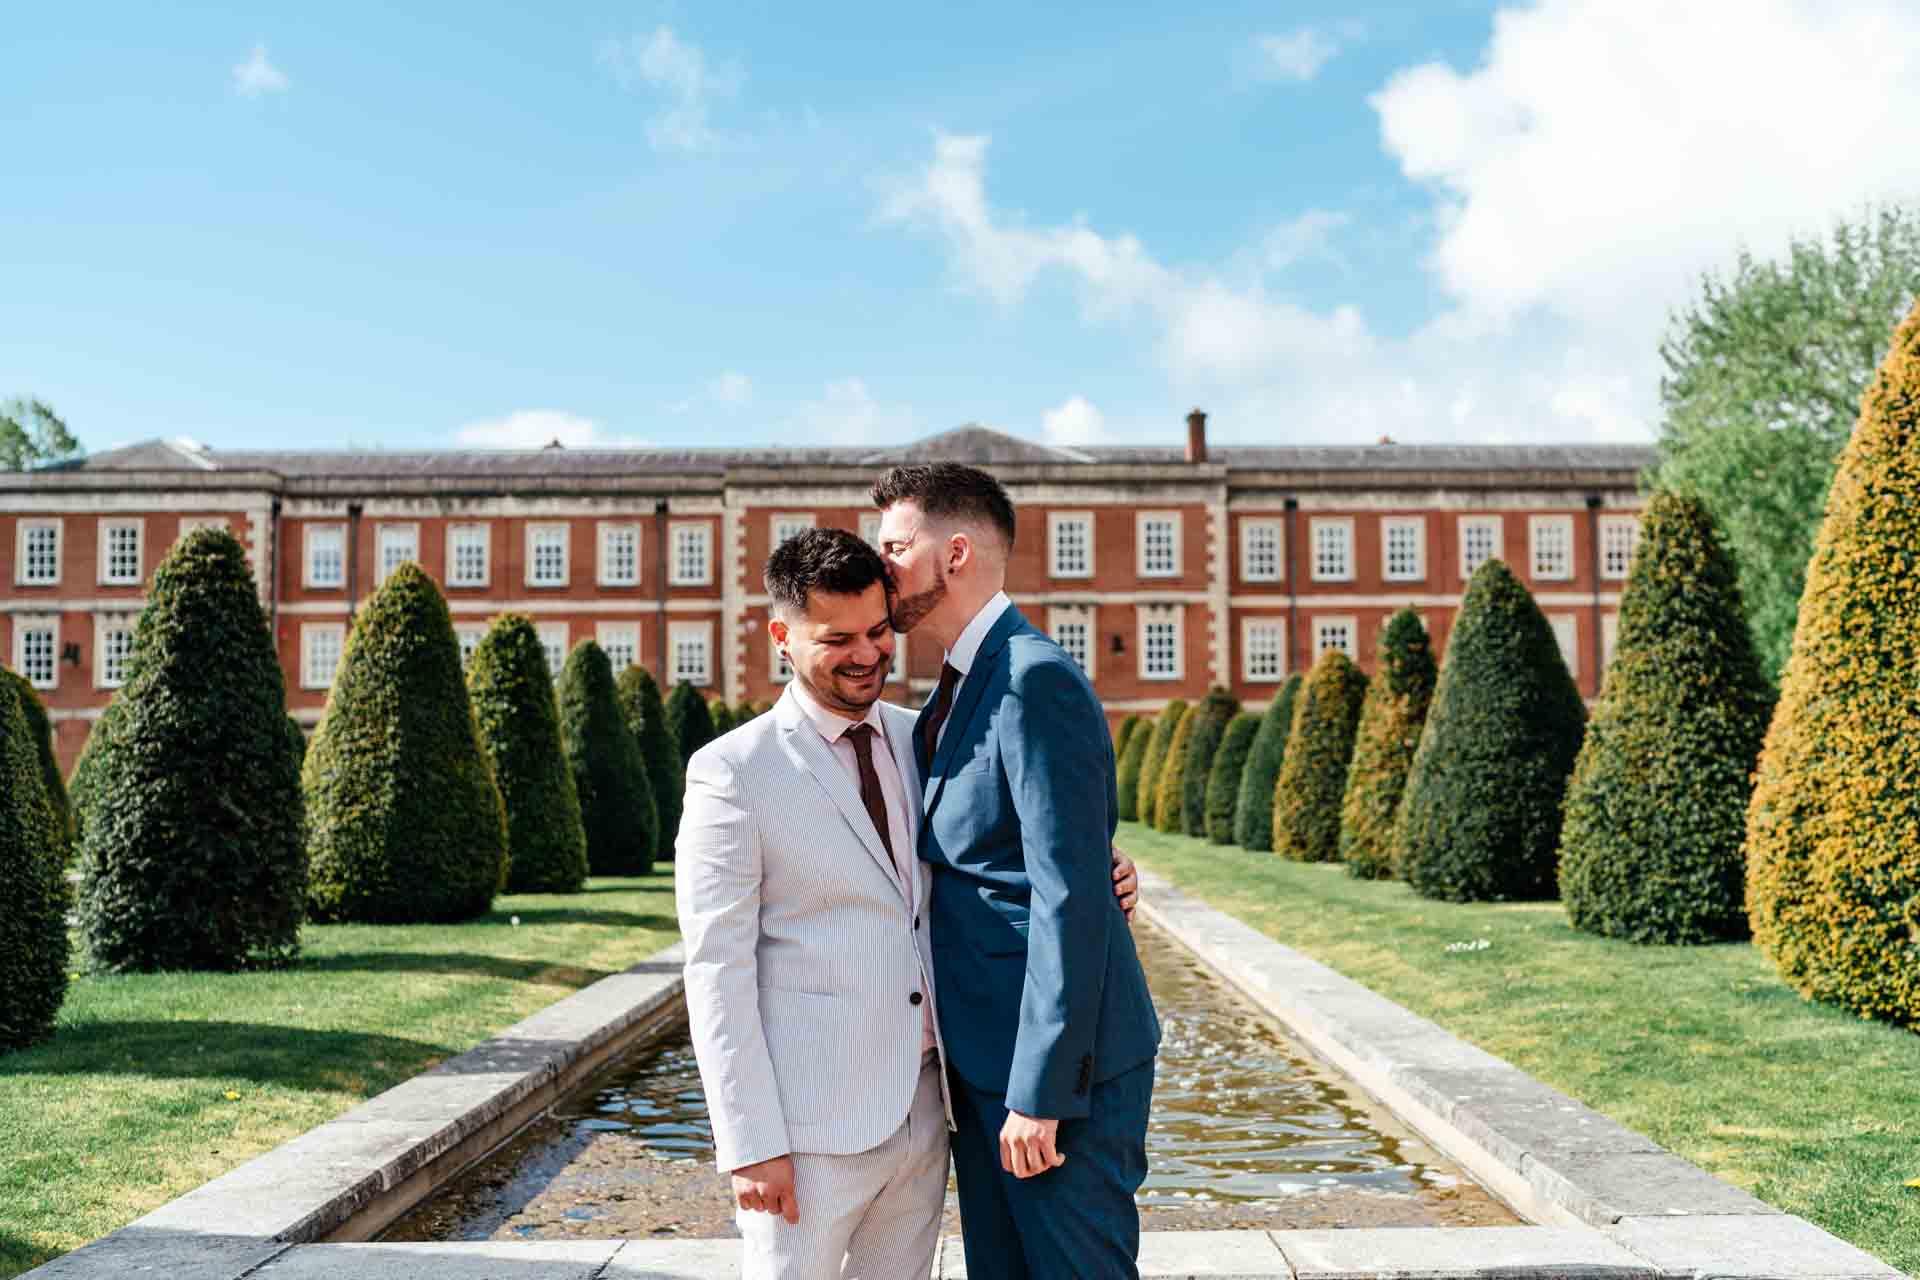 Winchester Registry Office same sex wedding